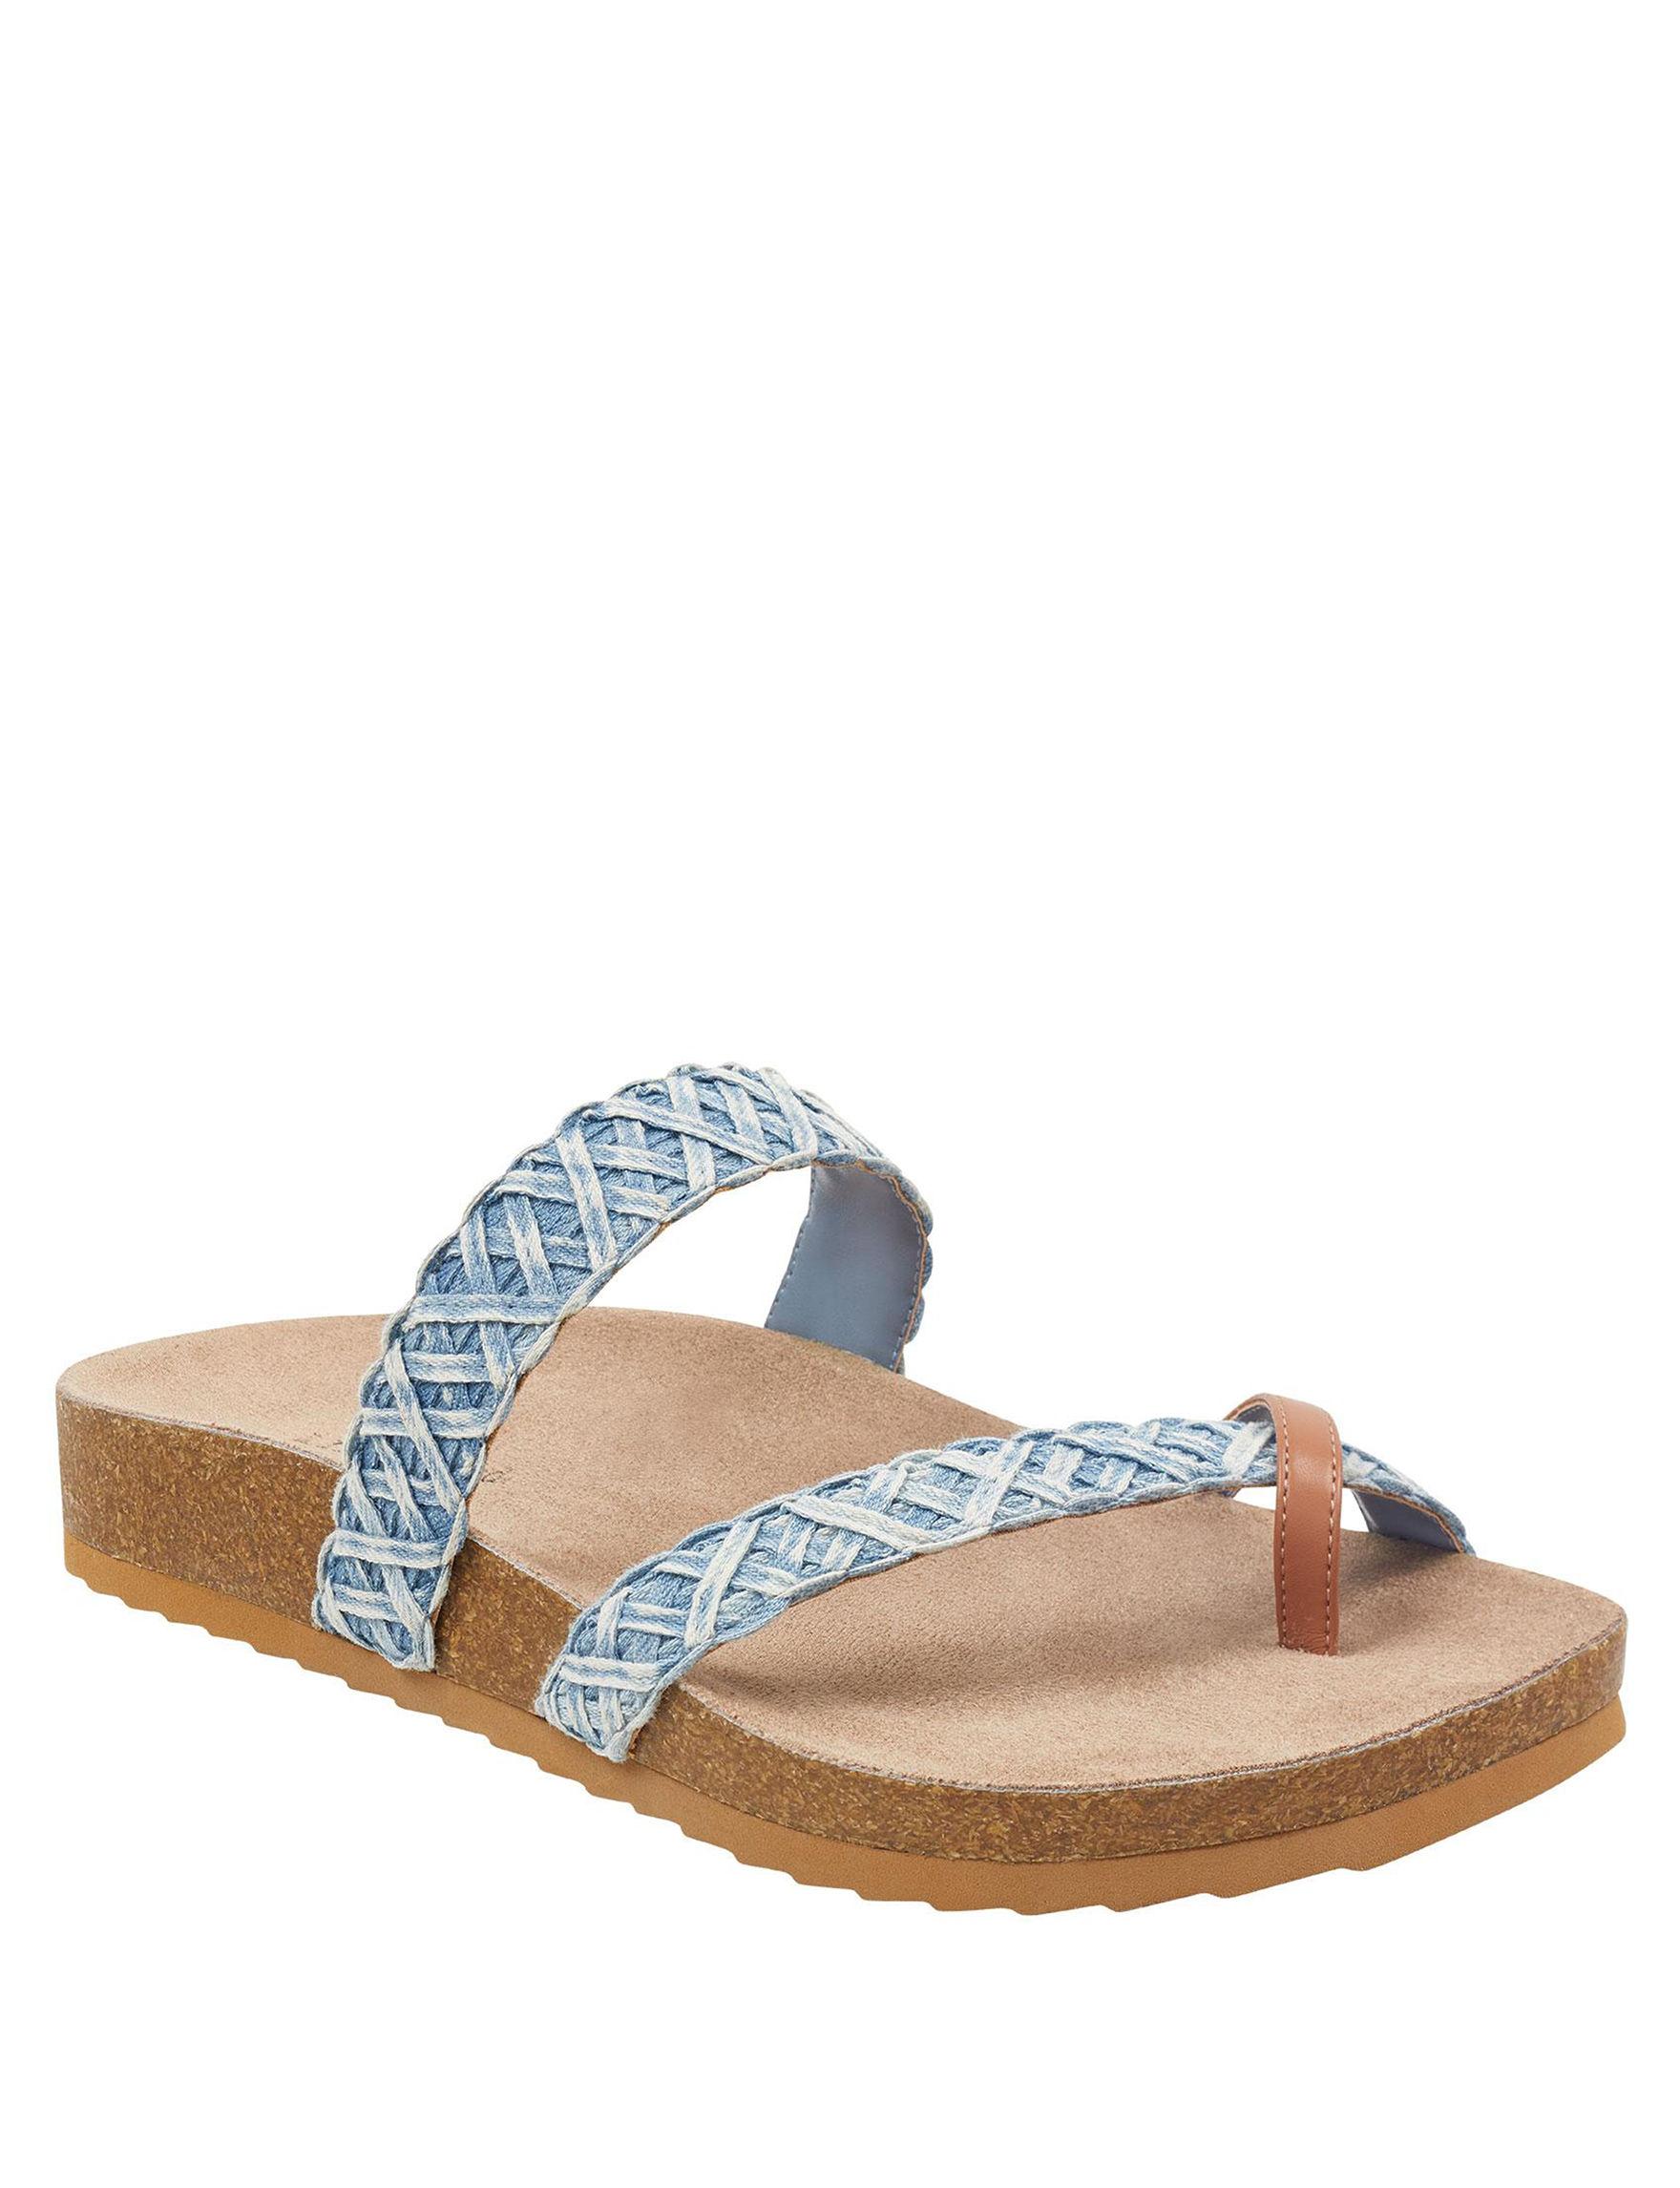 Indigo Rd. Blue Flat Sandals